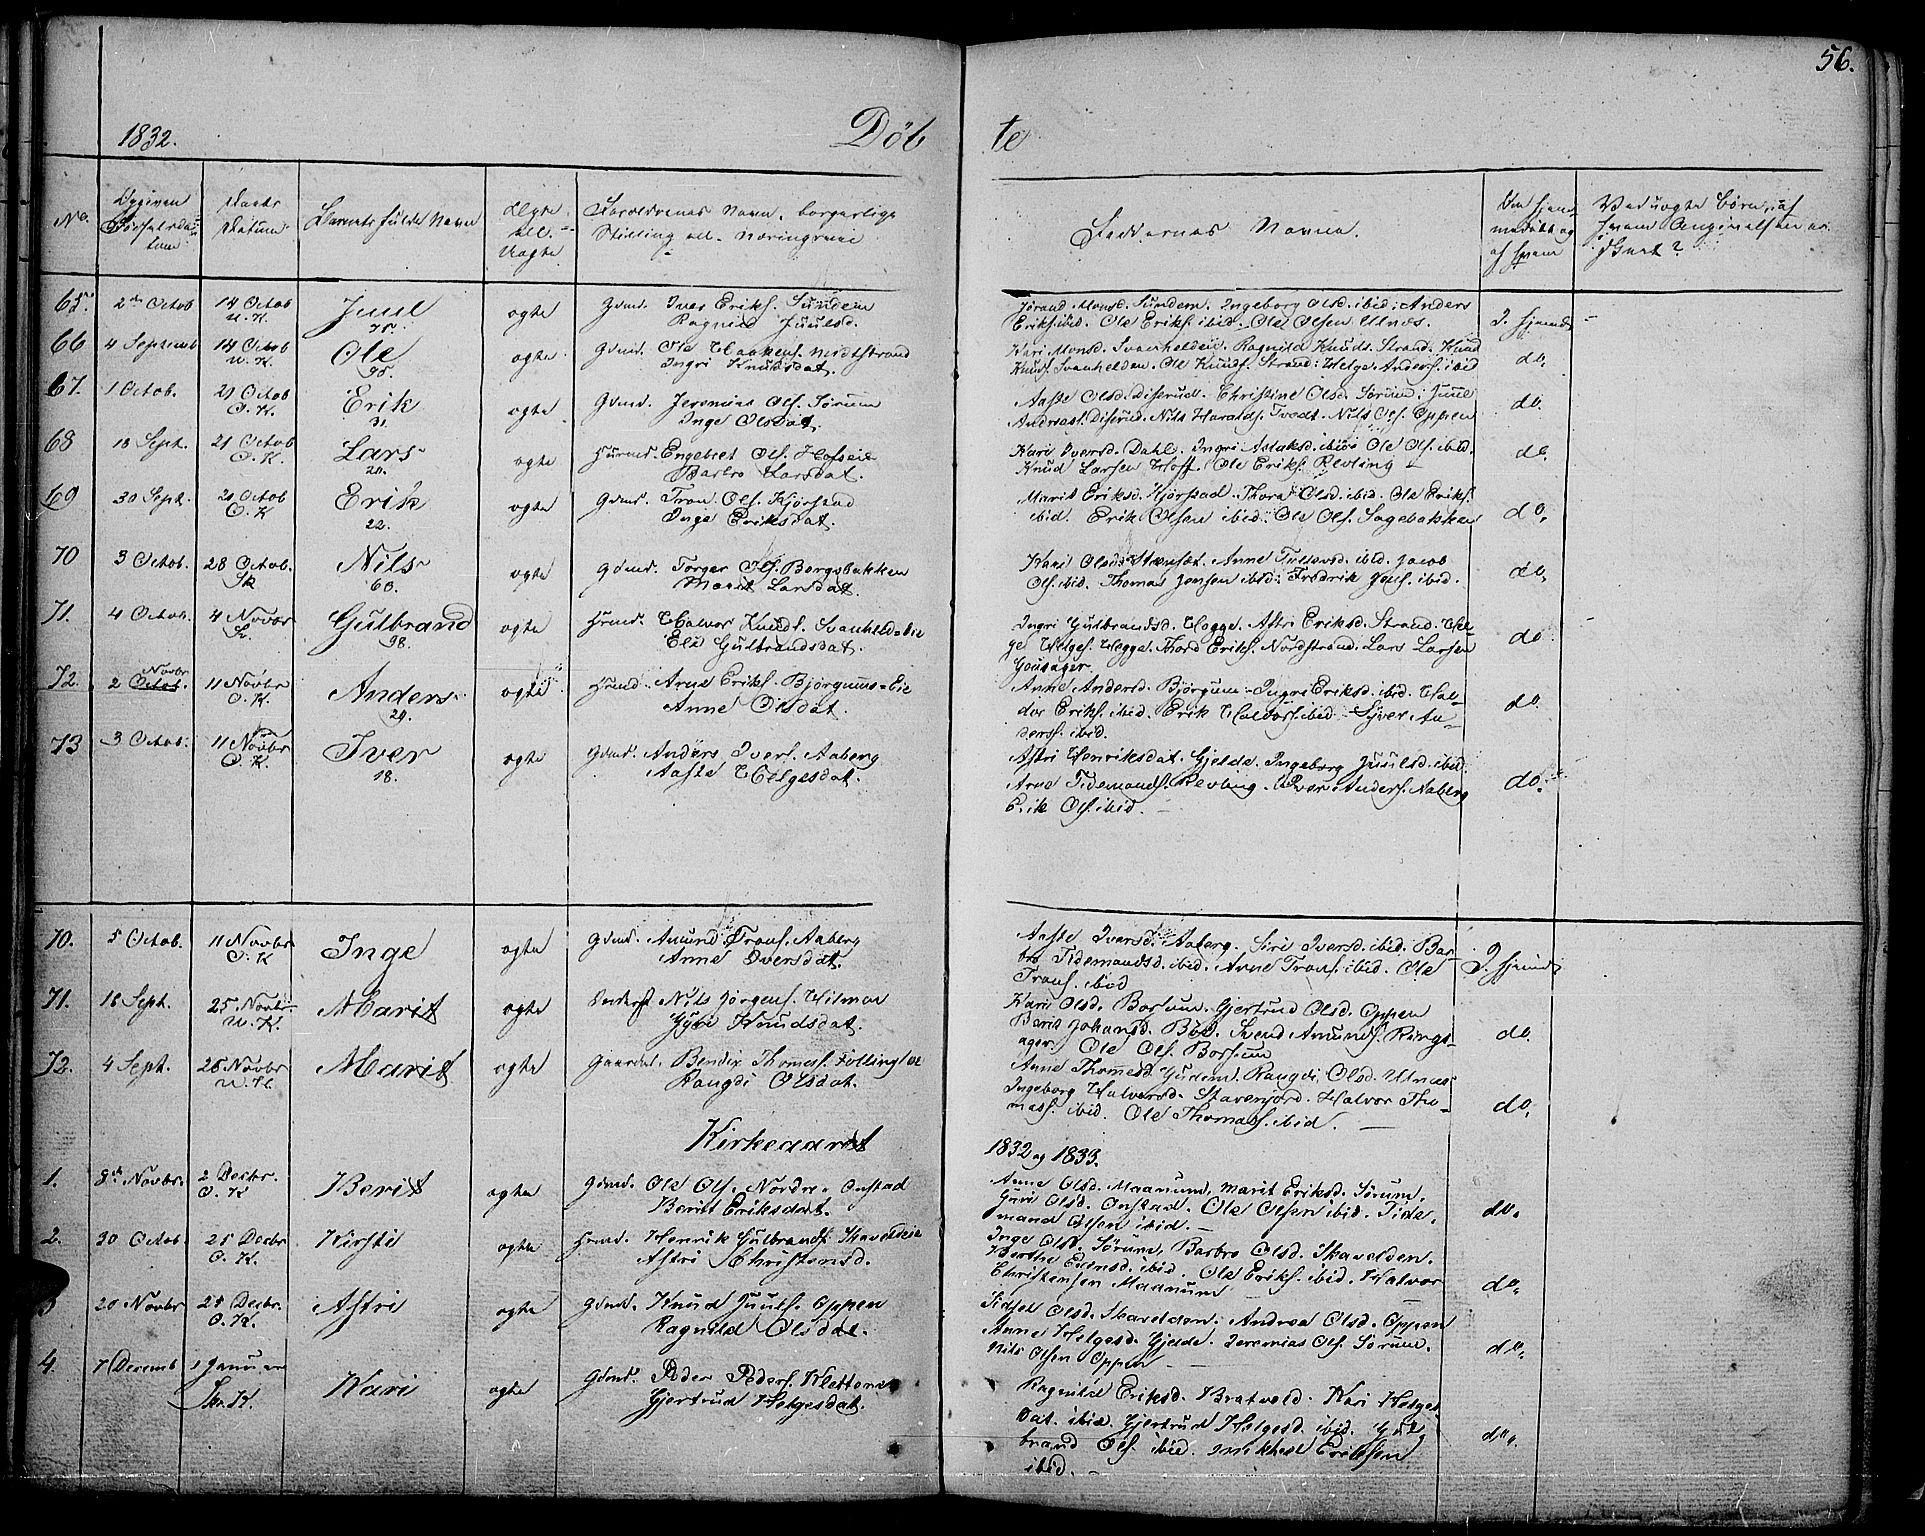 SAH, Nord-Aurdal prestekontor, Ministerialbok nr. 3, 1828-1841, s. 56